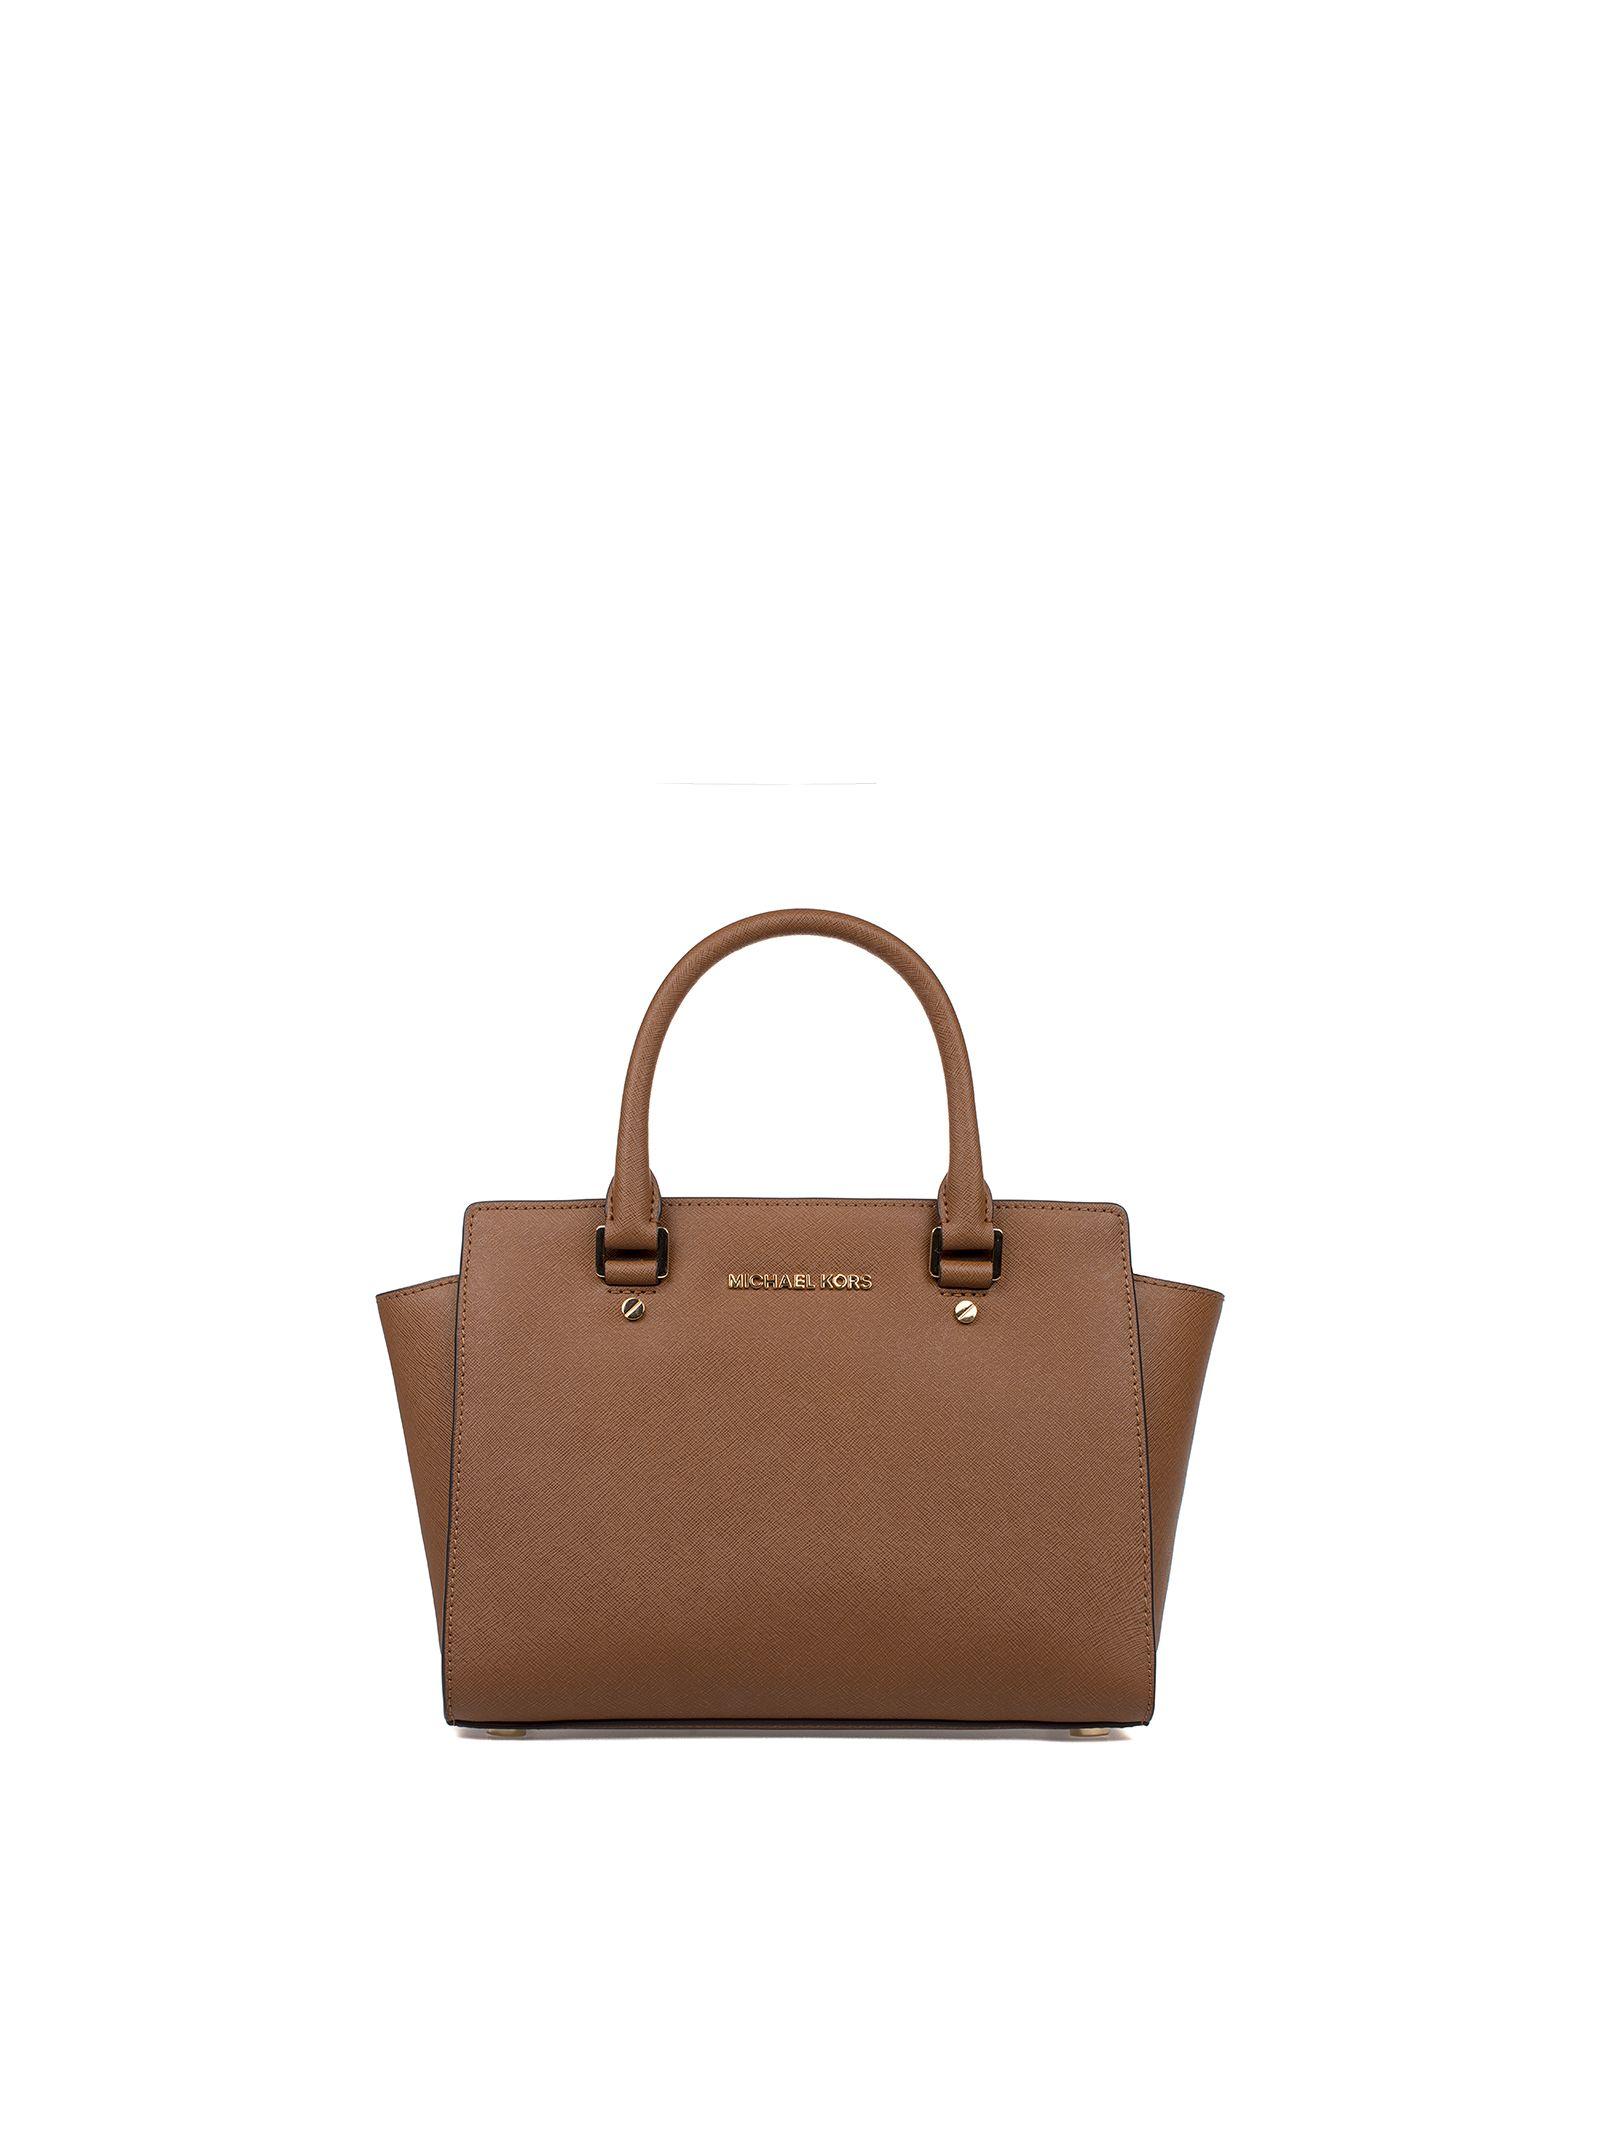 michael kors female luggage medium selma seatchel saffiano leather top handle bag